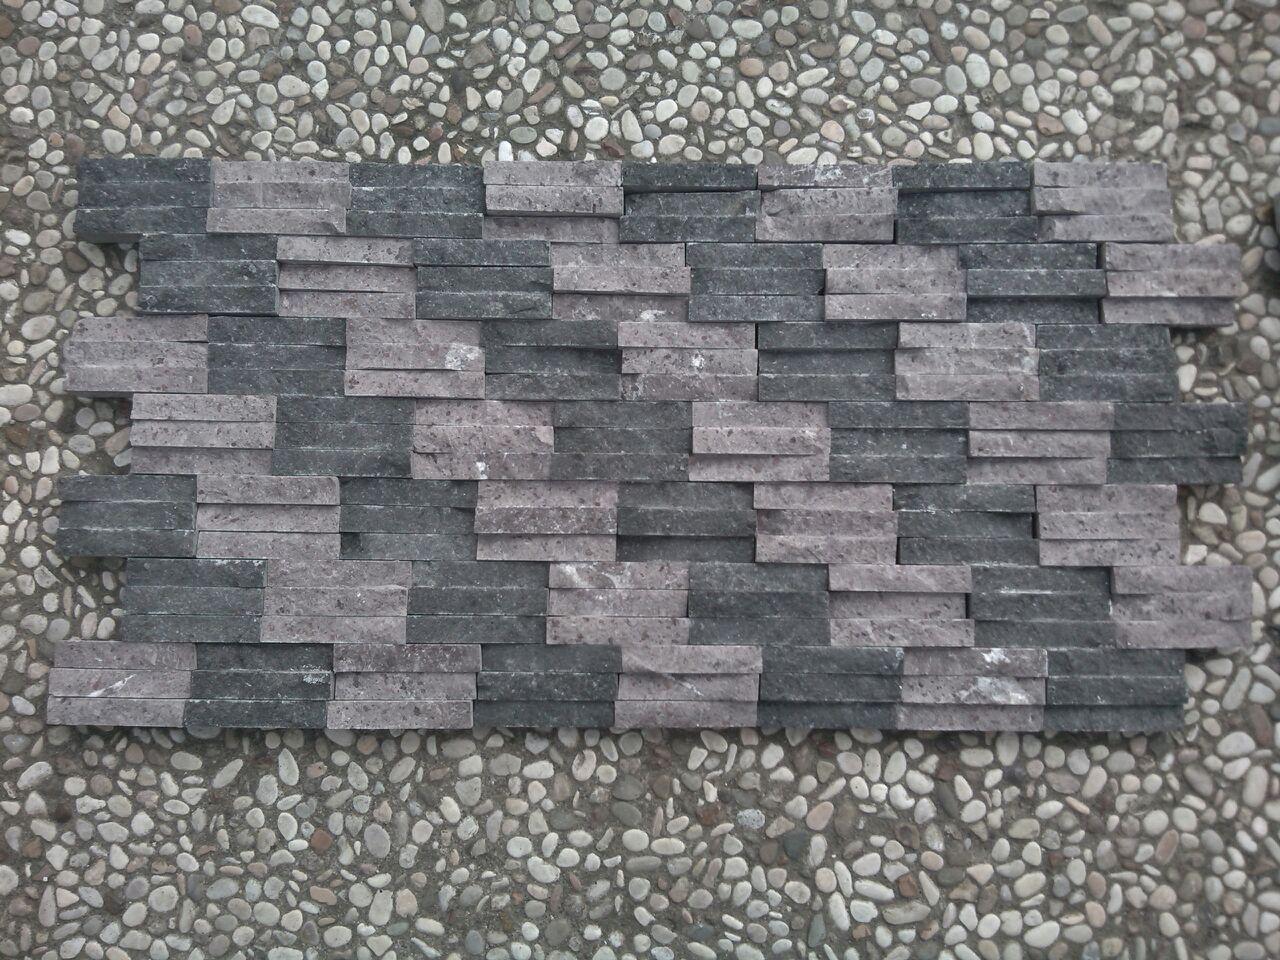 marmer granit batu alam kerajinan onix mozaik